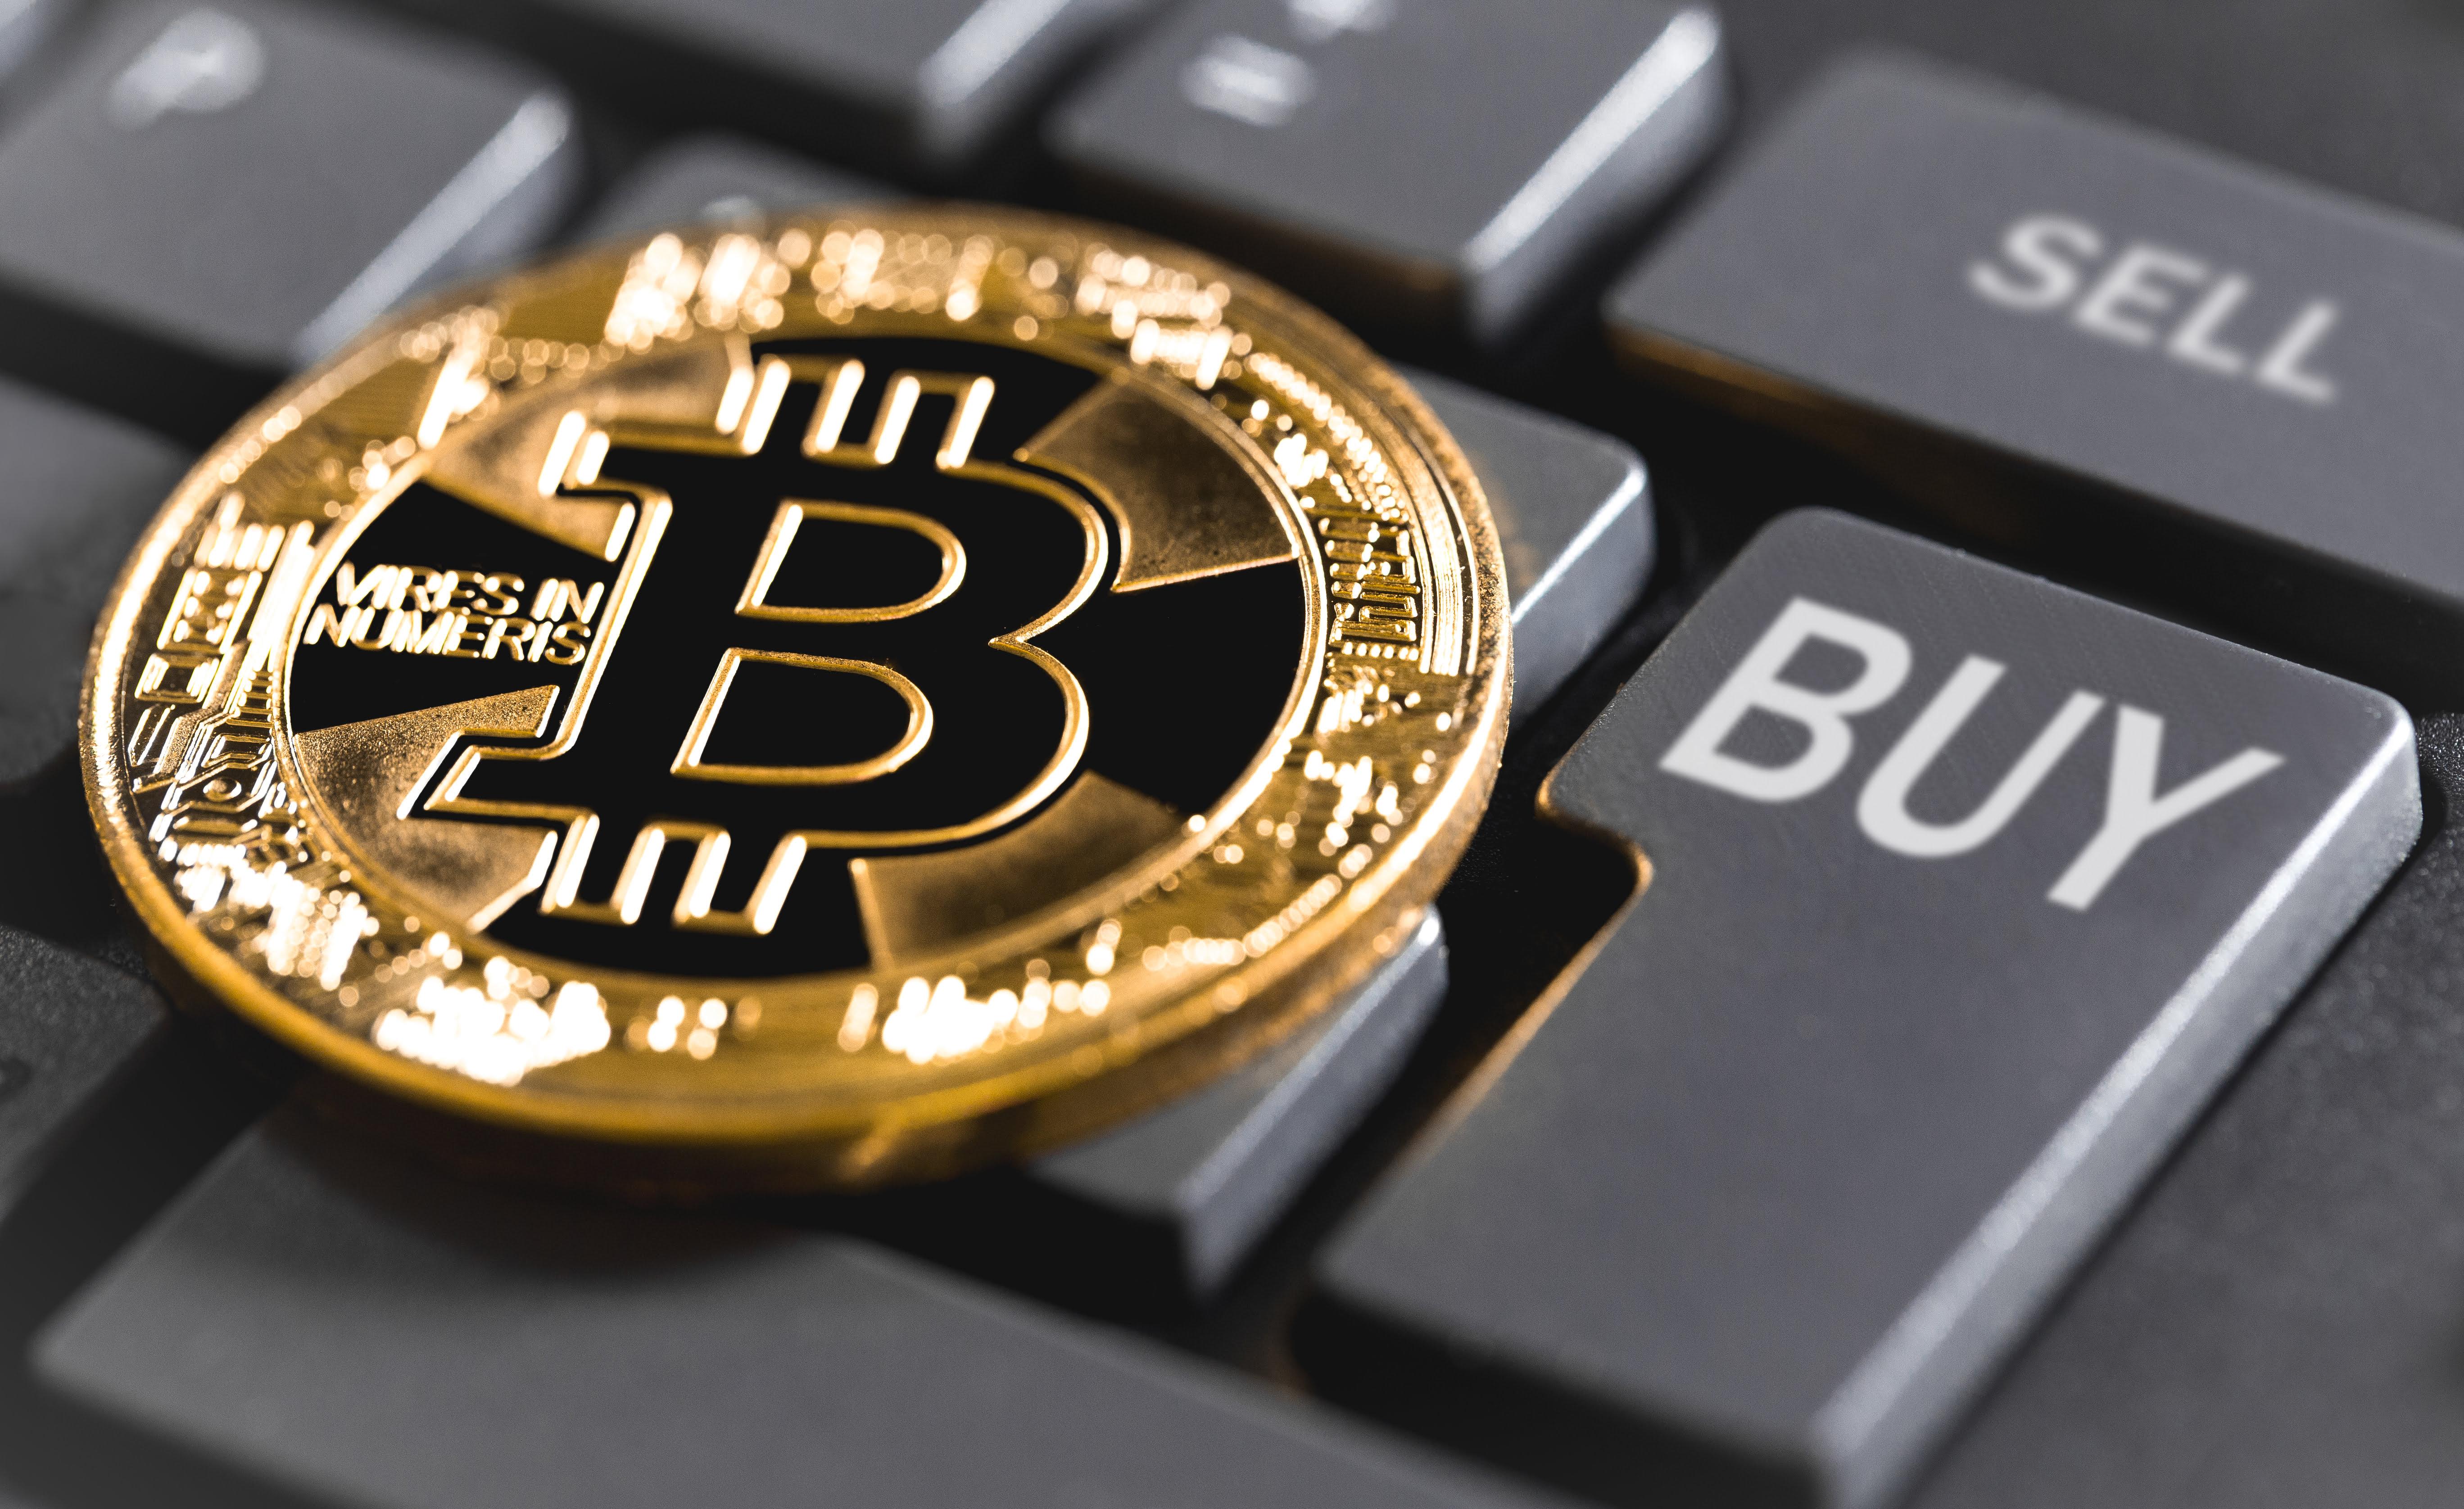 10 Altcoin Ini Capai All-Time-High Baru di Tengah Pergolakan Bitcoin dan Ethereum